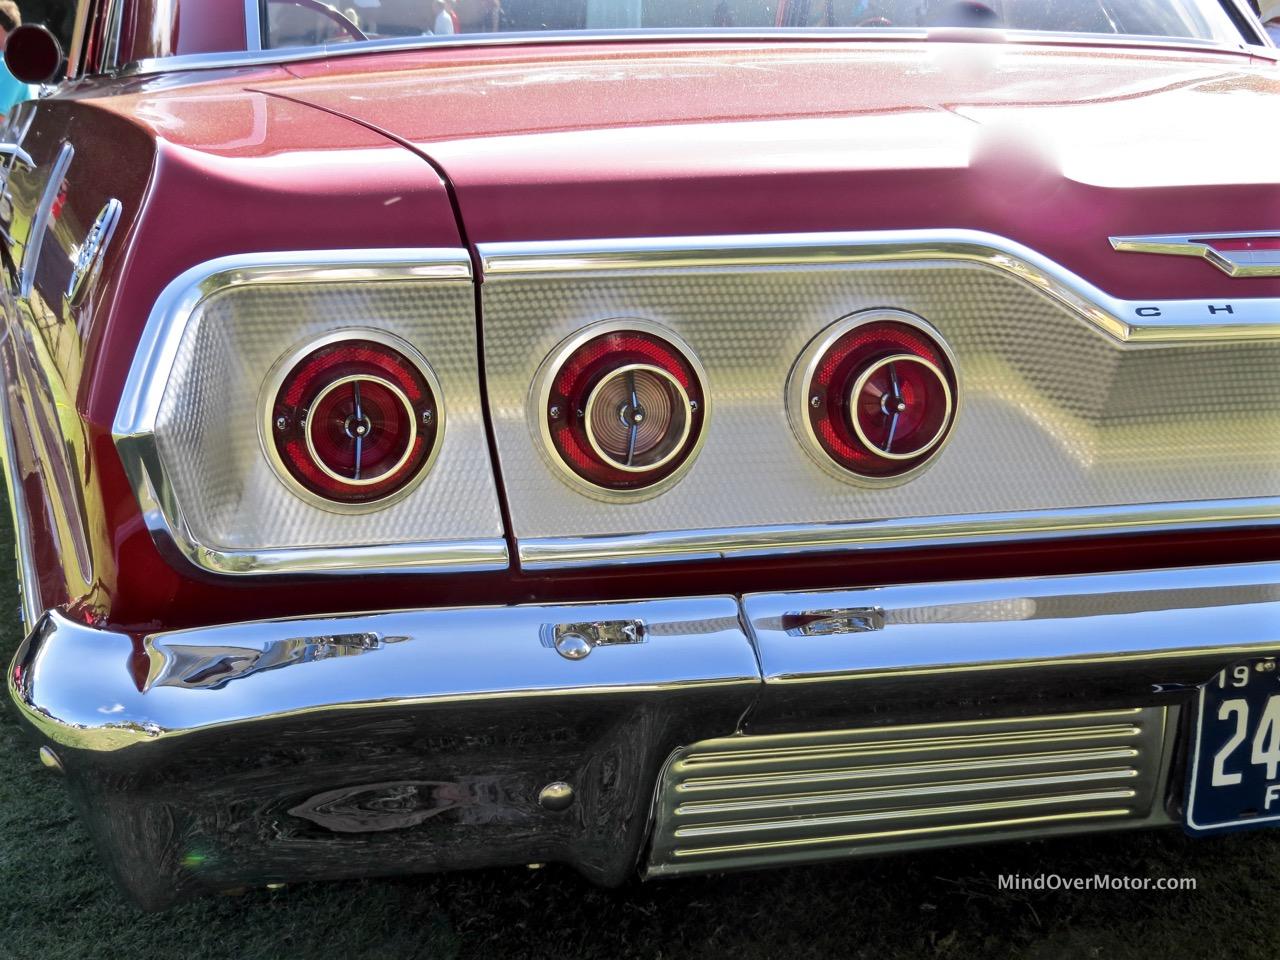 1963 Chevrolet Impala SS Taillights